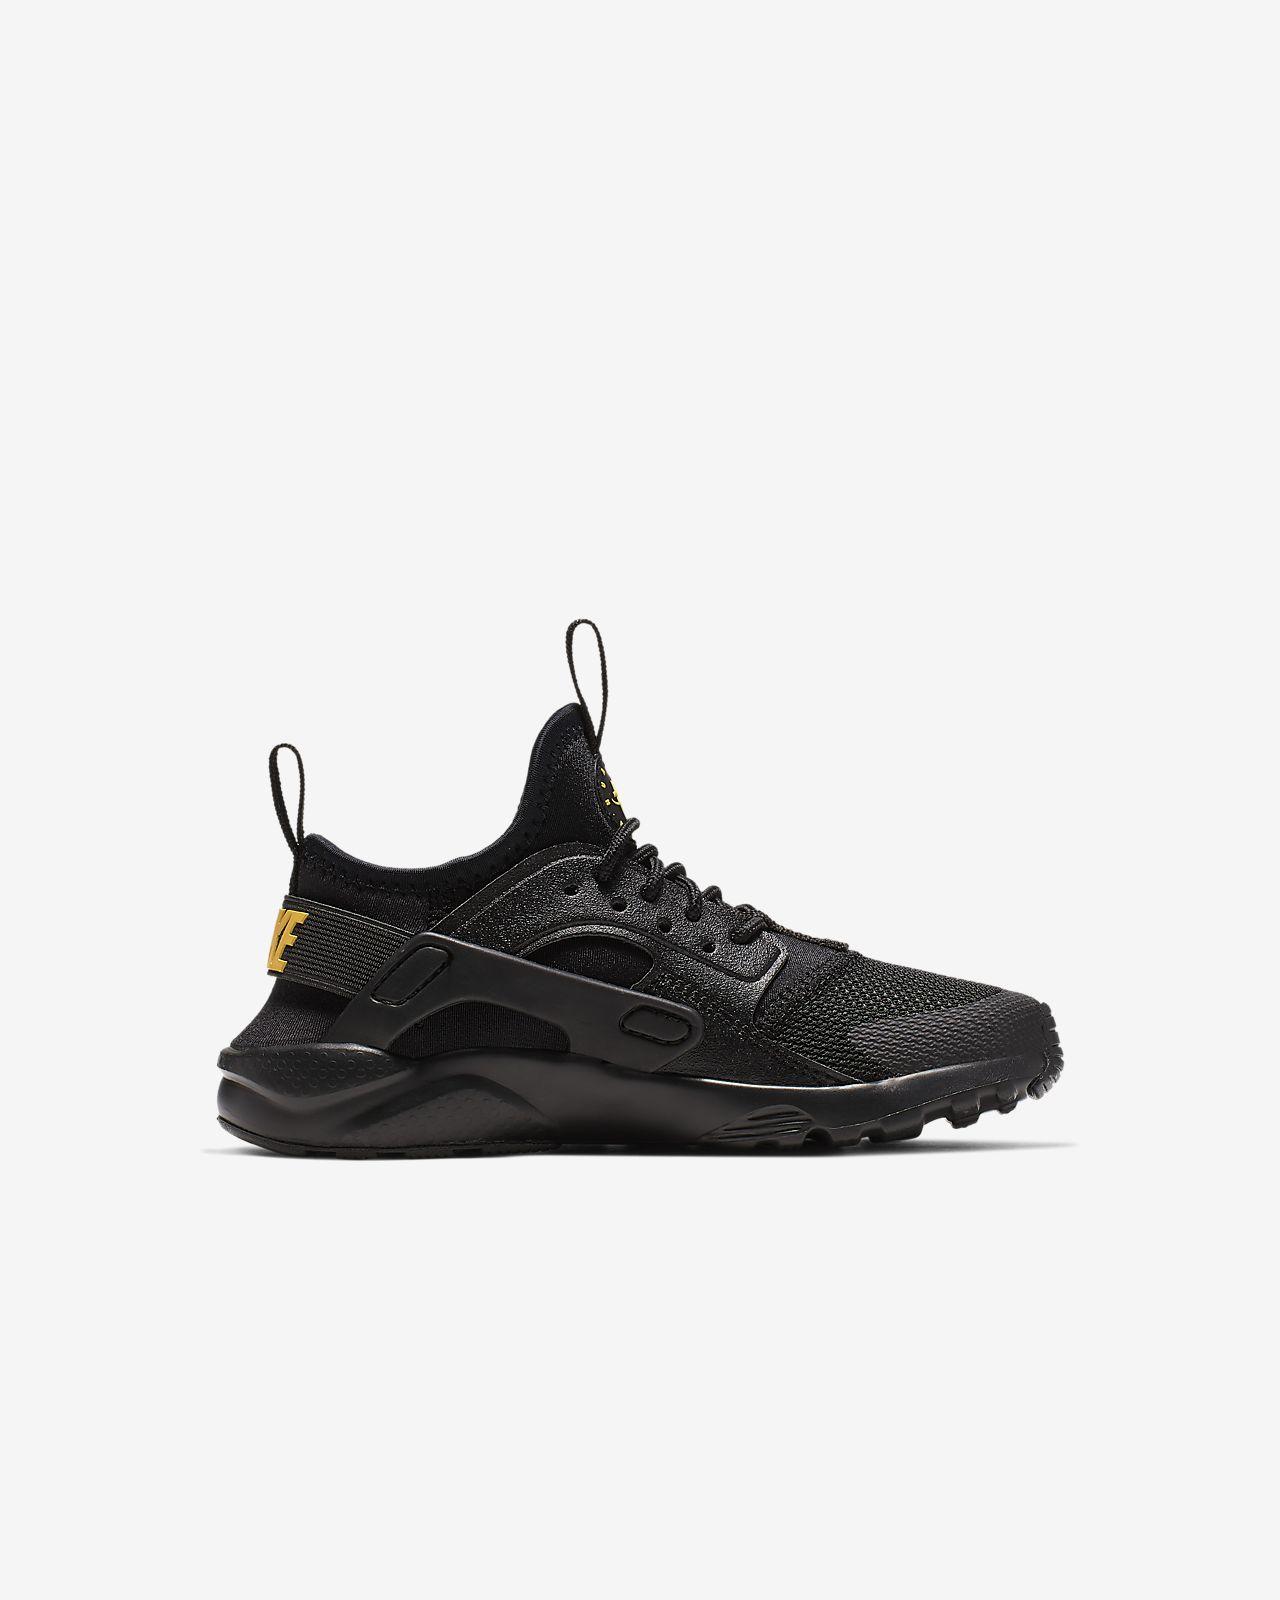 on sale 4f6a7 b436f ... Nike Huarache Run Ultra Schuh für jüngere Kinder